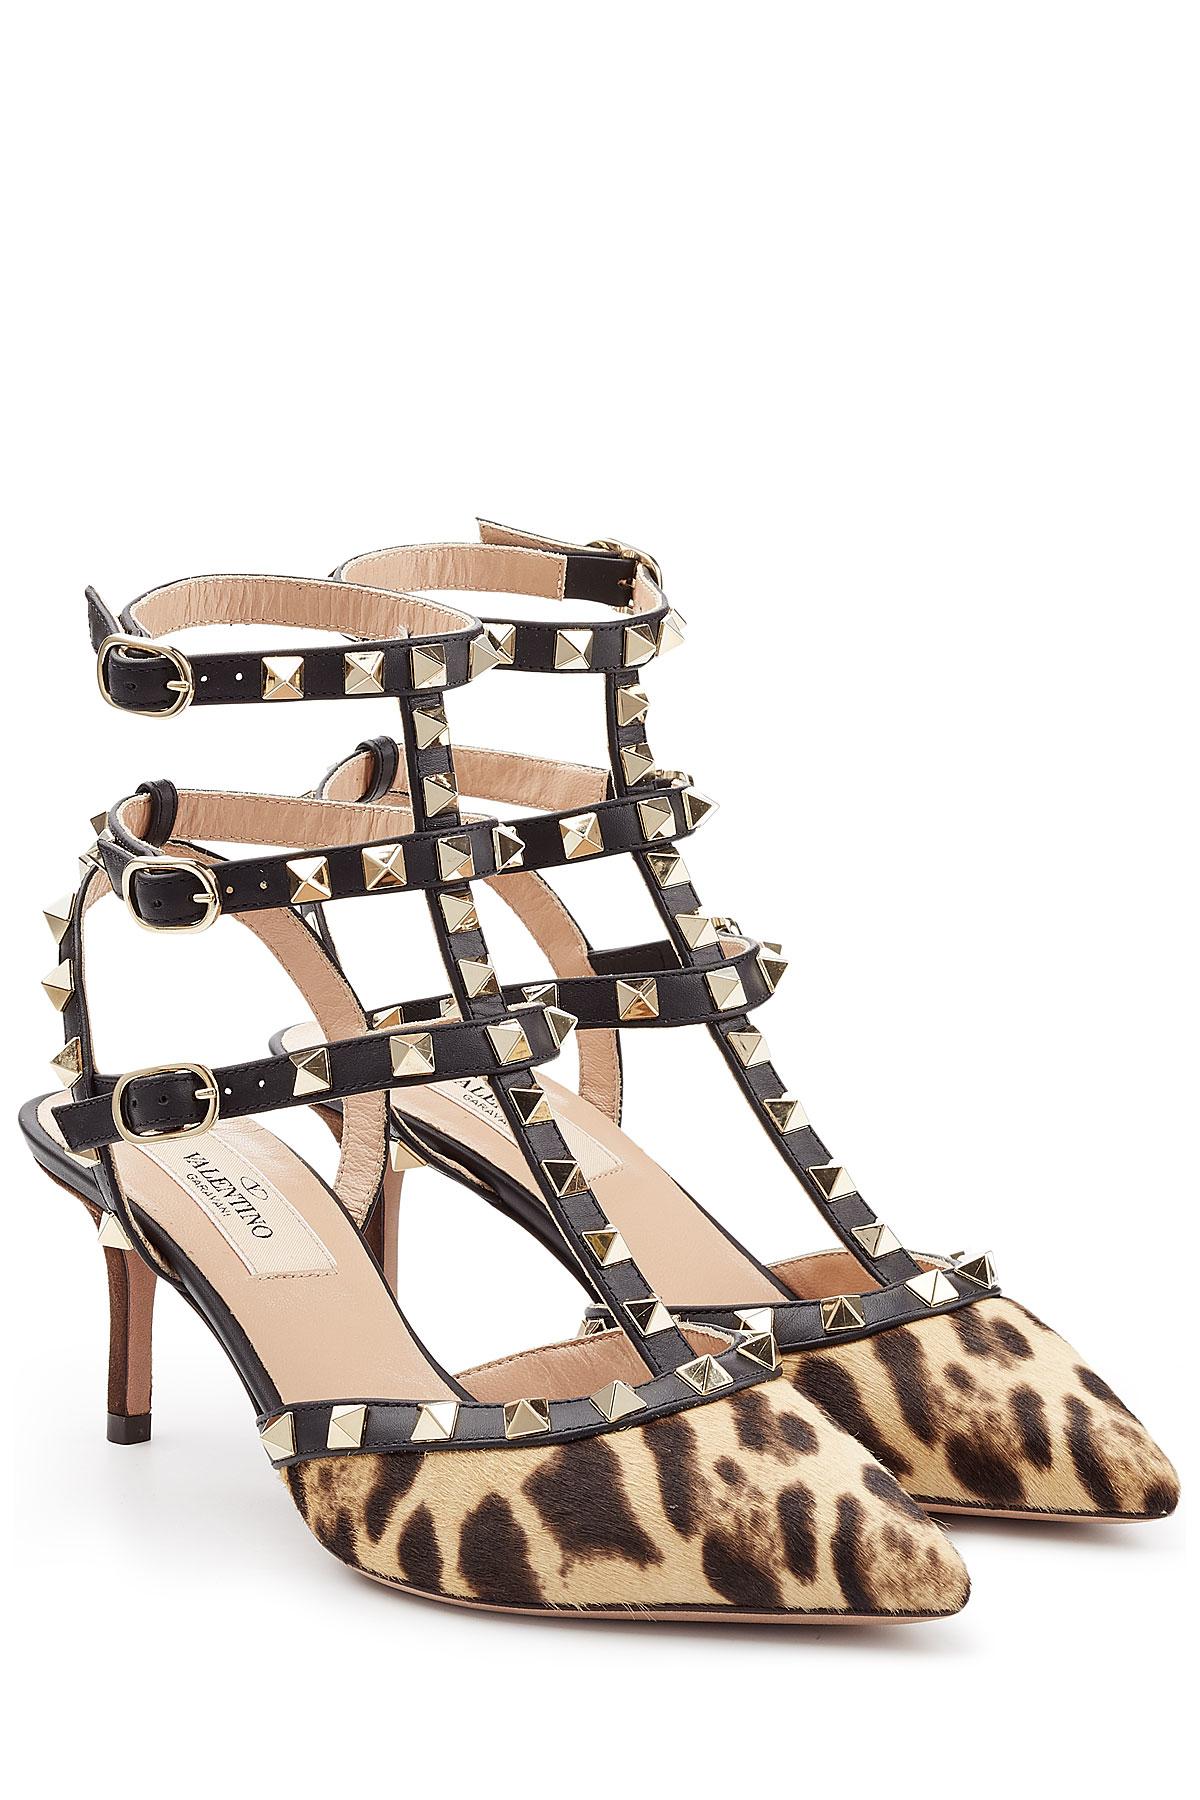 f78c770204a Lyst - Valentino Rockstud Calf Hair Kitten Heel Pumps - Animal Prints